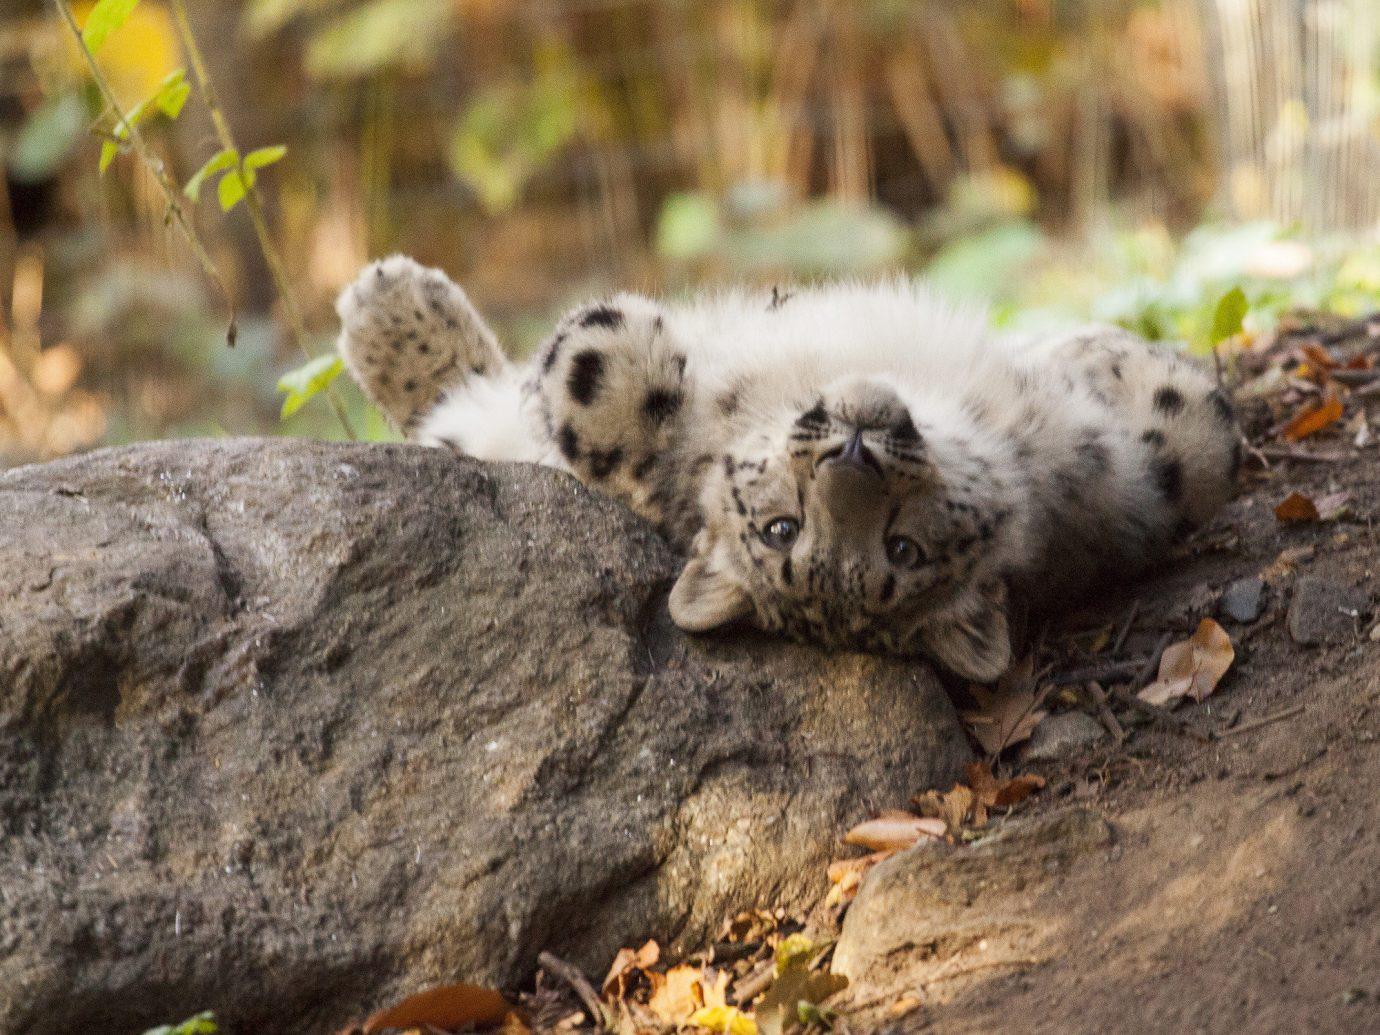 Budget outdoor grass animal mammal vertebrate Wildlife fauna snow leopard